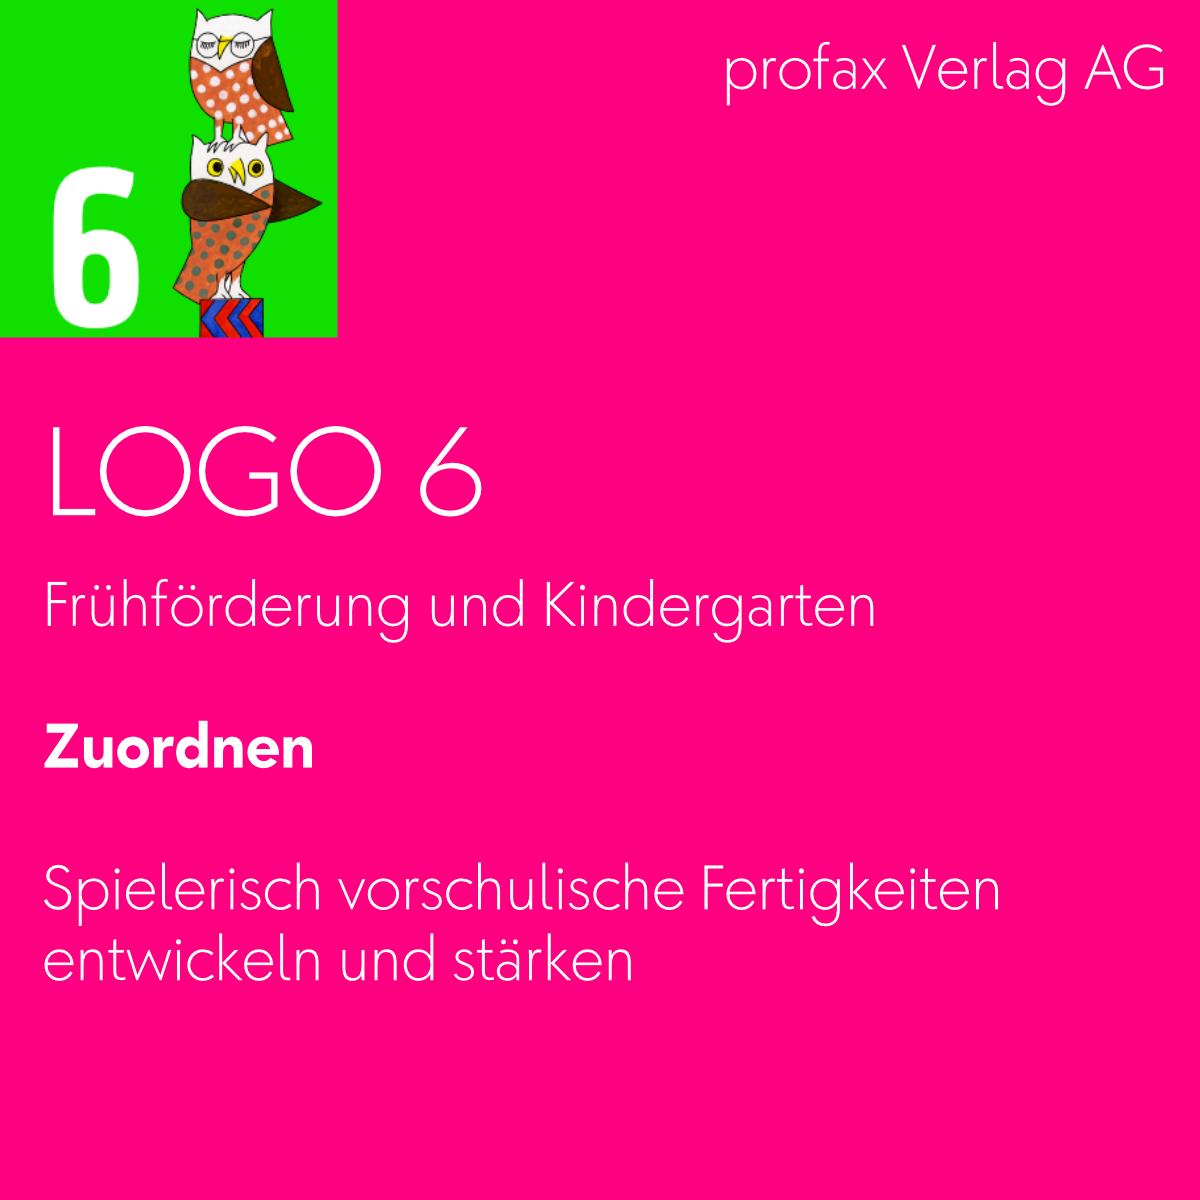 LOGO 6 – Zuordnen